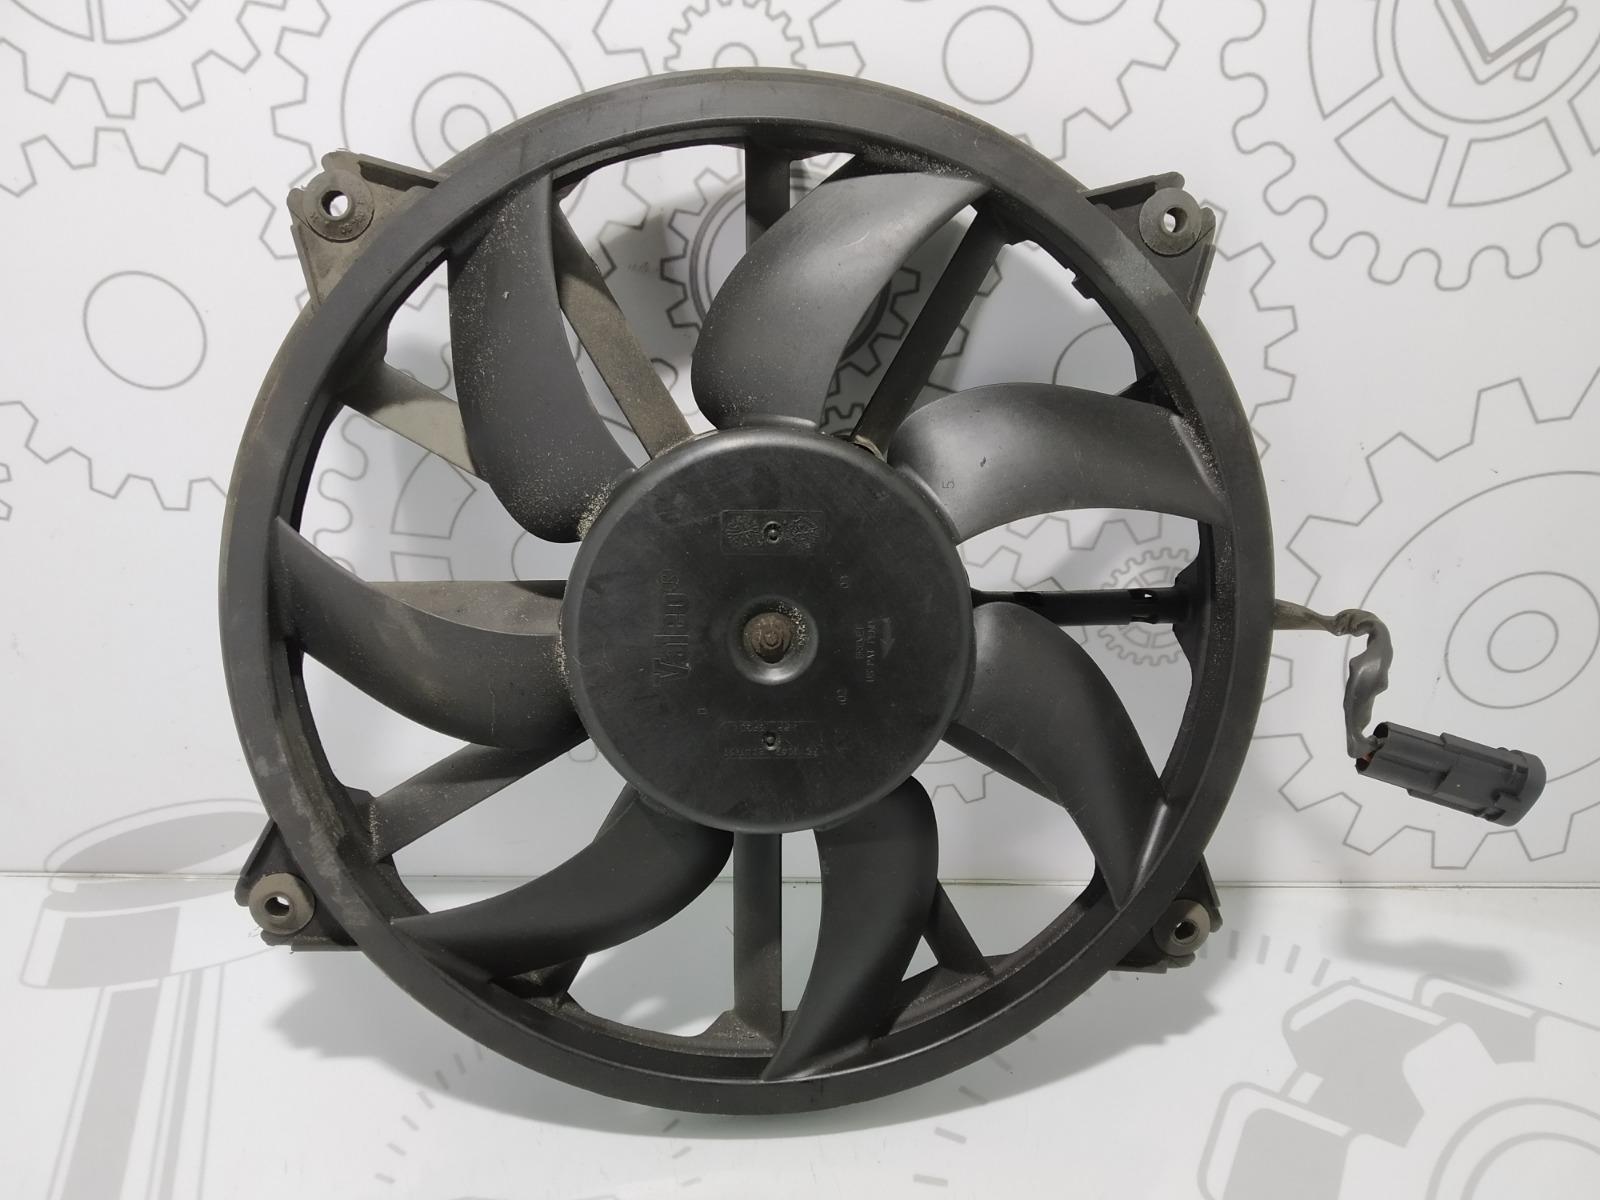 Вентилятор радиатора Peugeot 308 T7 1.6 HDI 2008 (б/у)